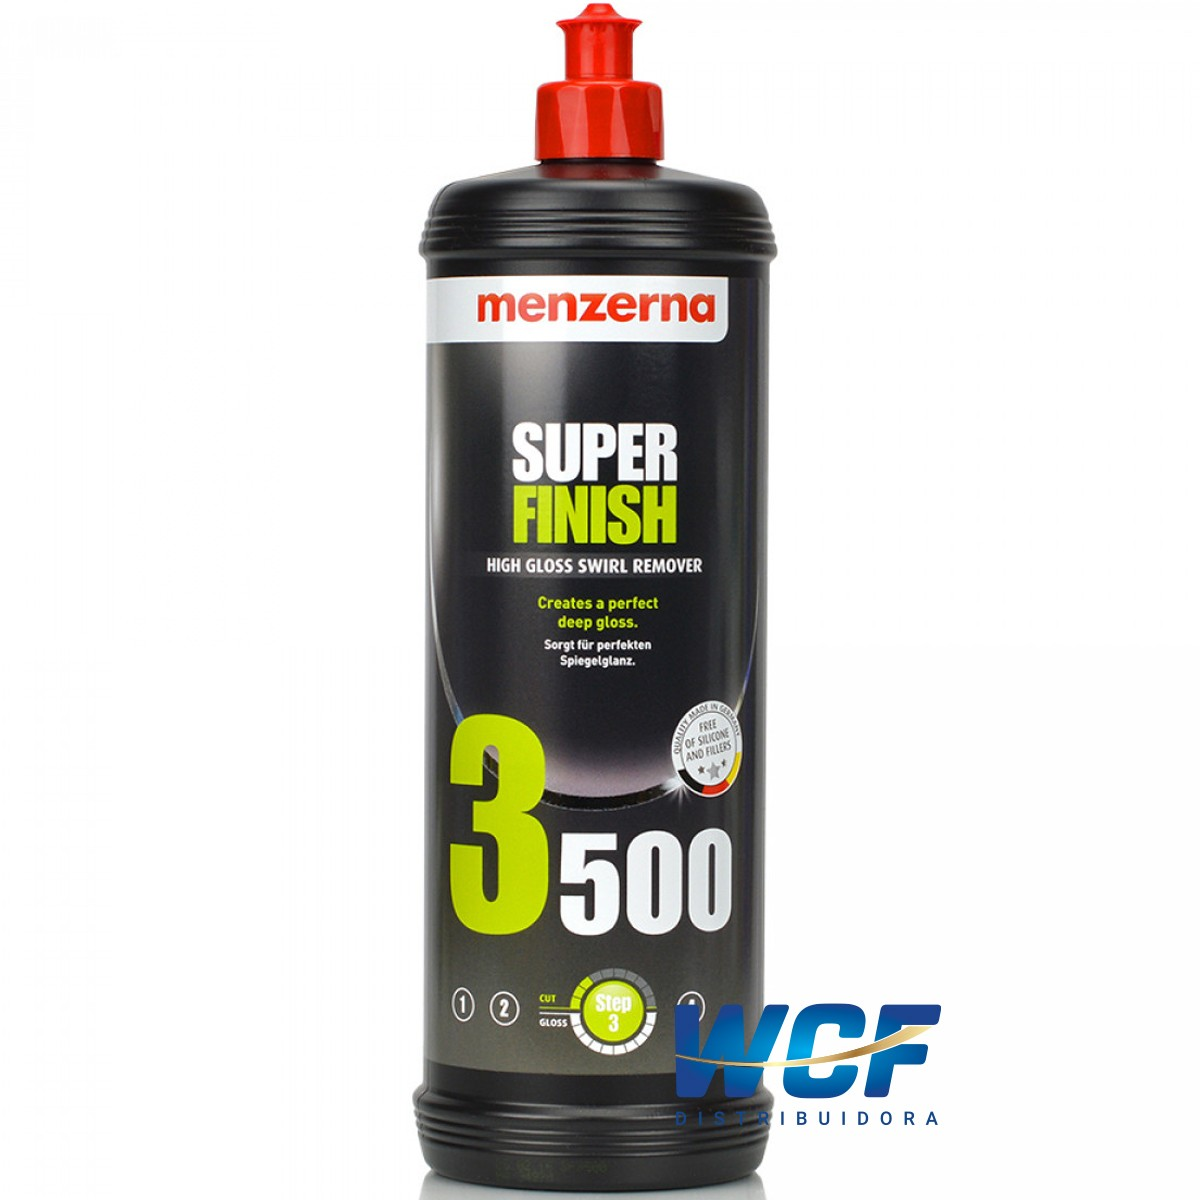 SUPER FINISH HIGH GLOSS SWIRL REMOVER 3500 1LT MENZERNA